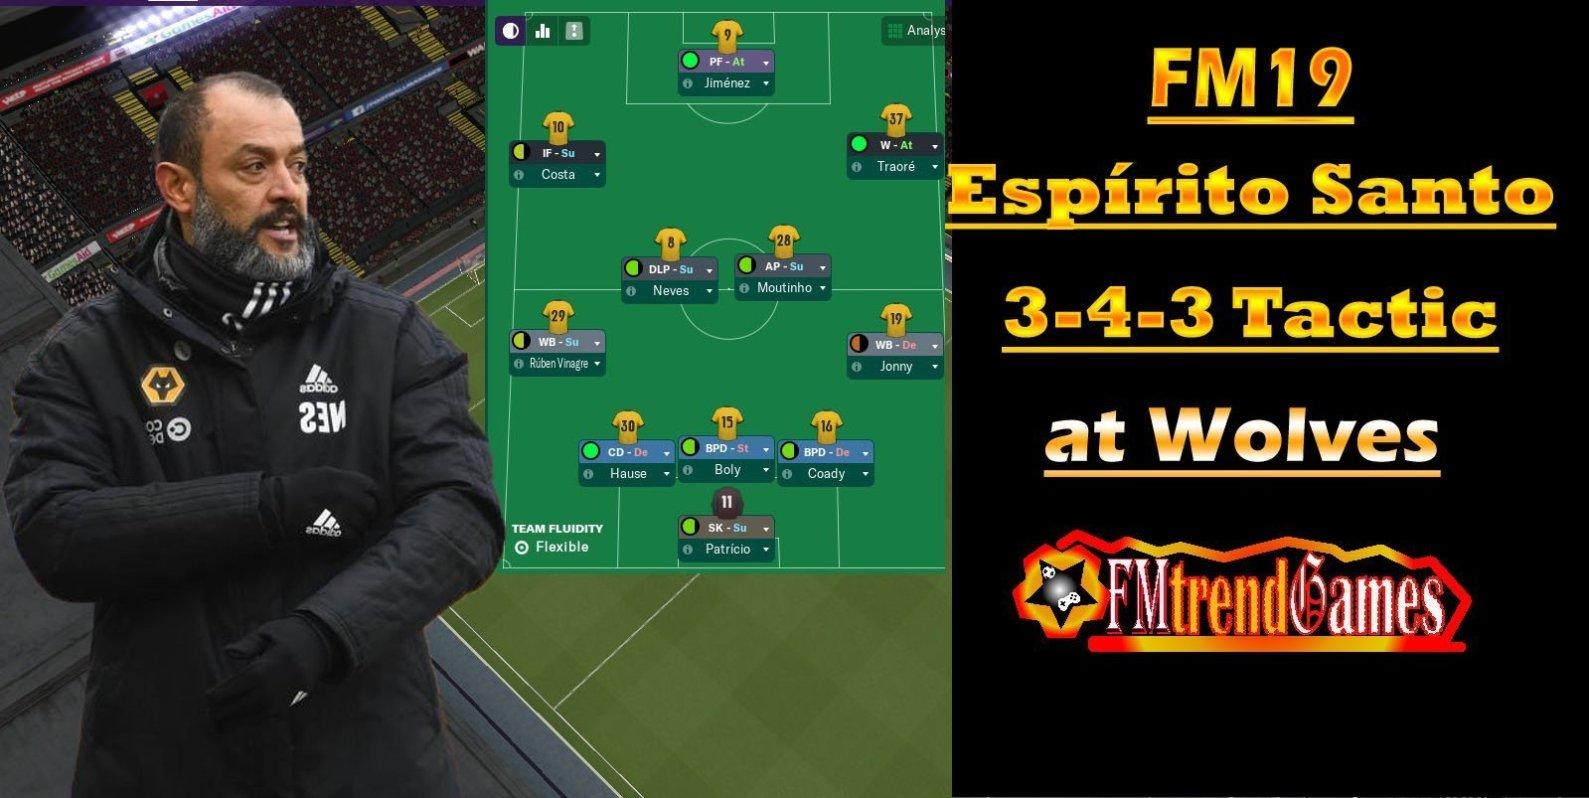 FM19 Nuno Espírito Santo's 3-4-3 Tactic at Wolves | FMtrendGames